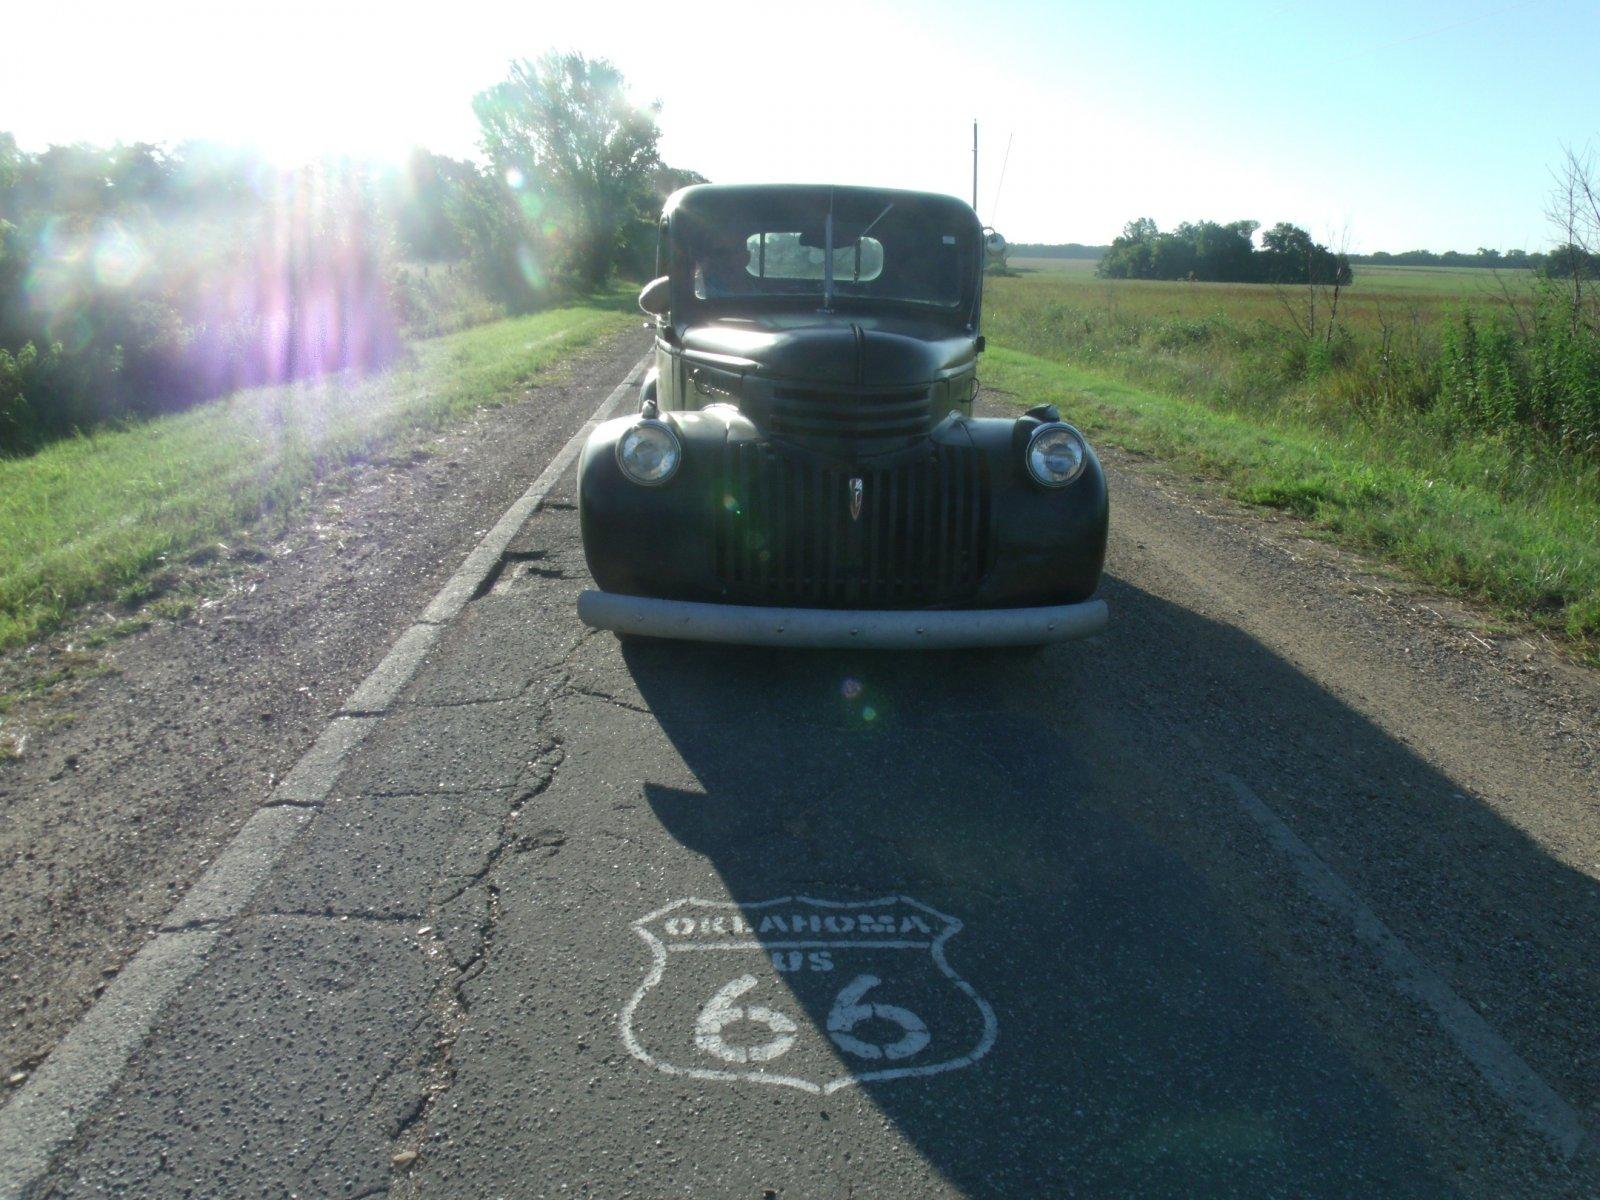 rt 66 day 2 025 sidewalk highway 1.jpg